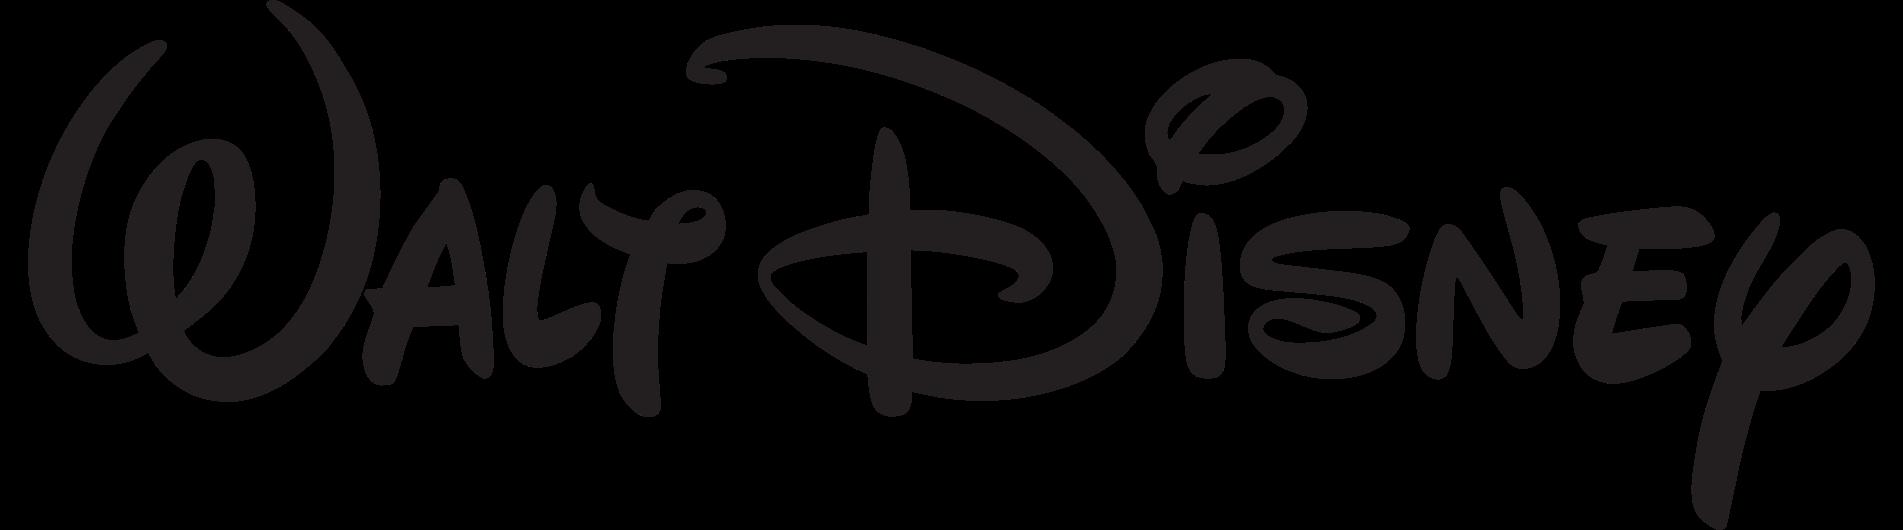 Walt Disney Logo.